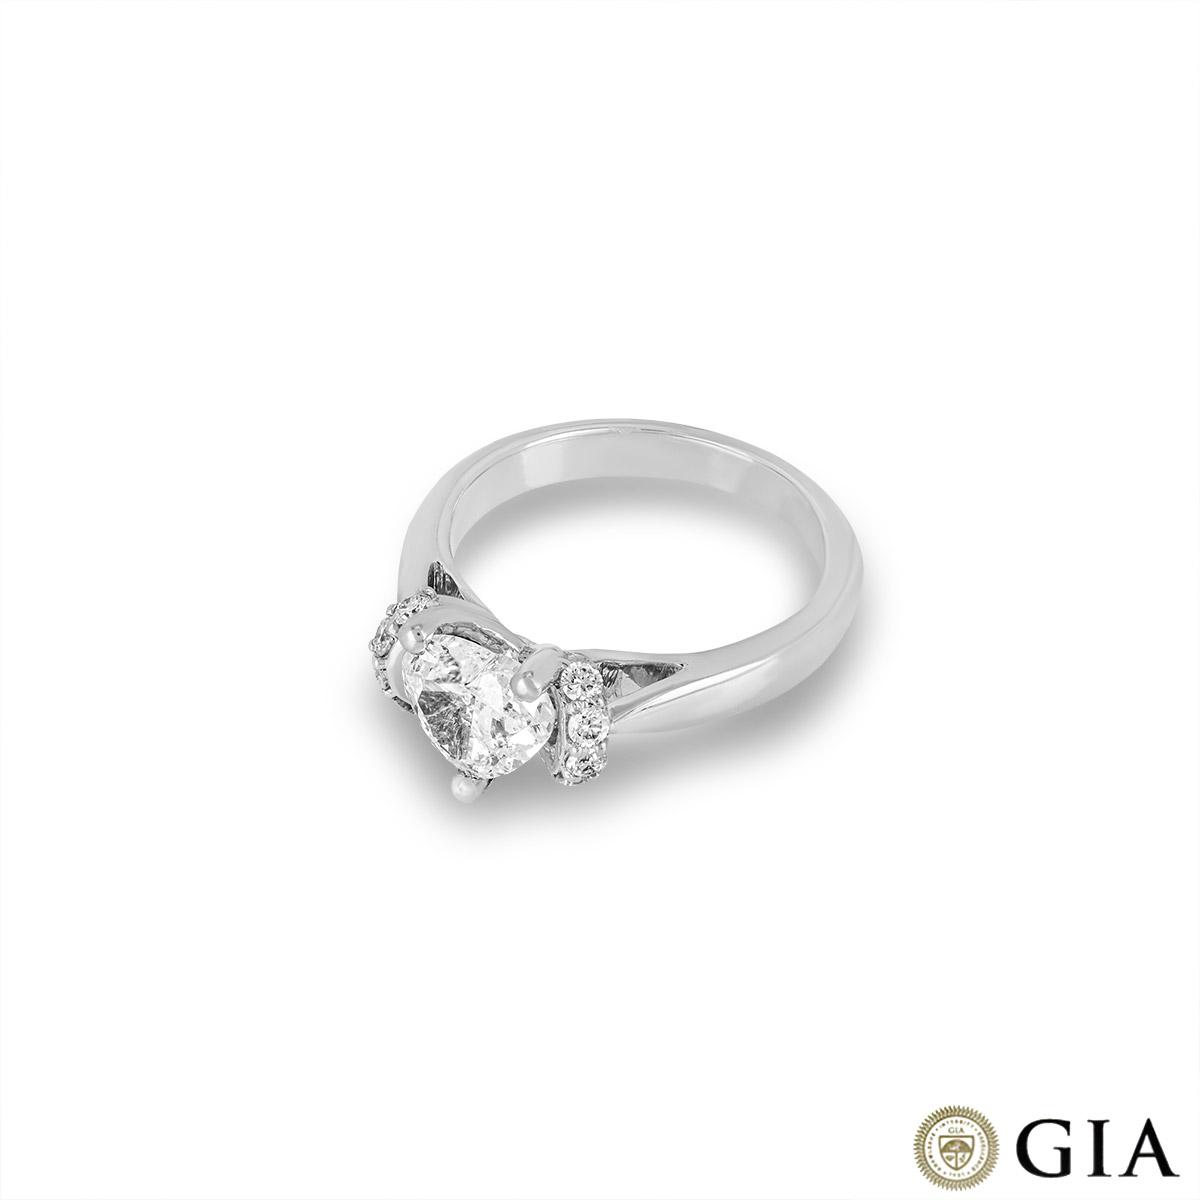 18k White Gold Heart Cut Diamond Ring 1.20ct F/SI2